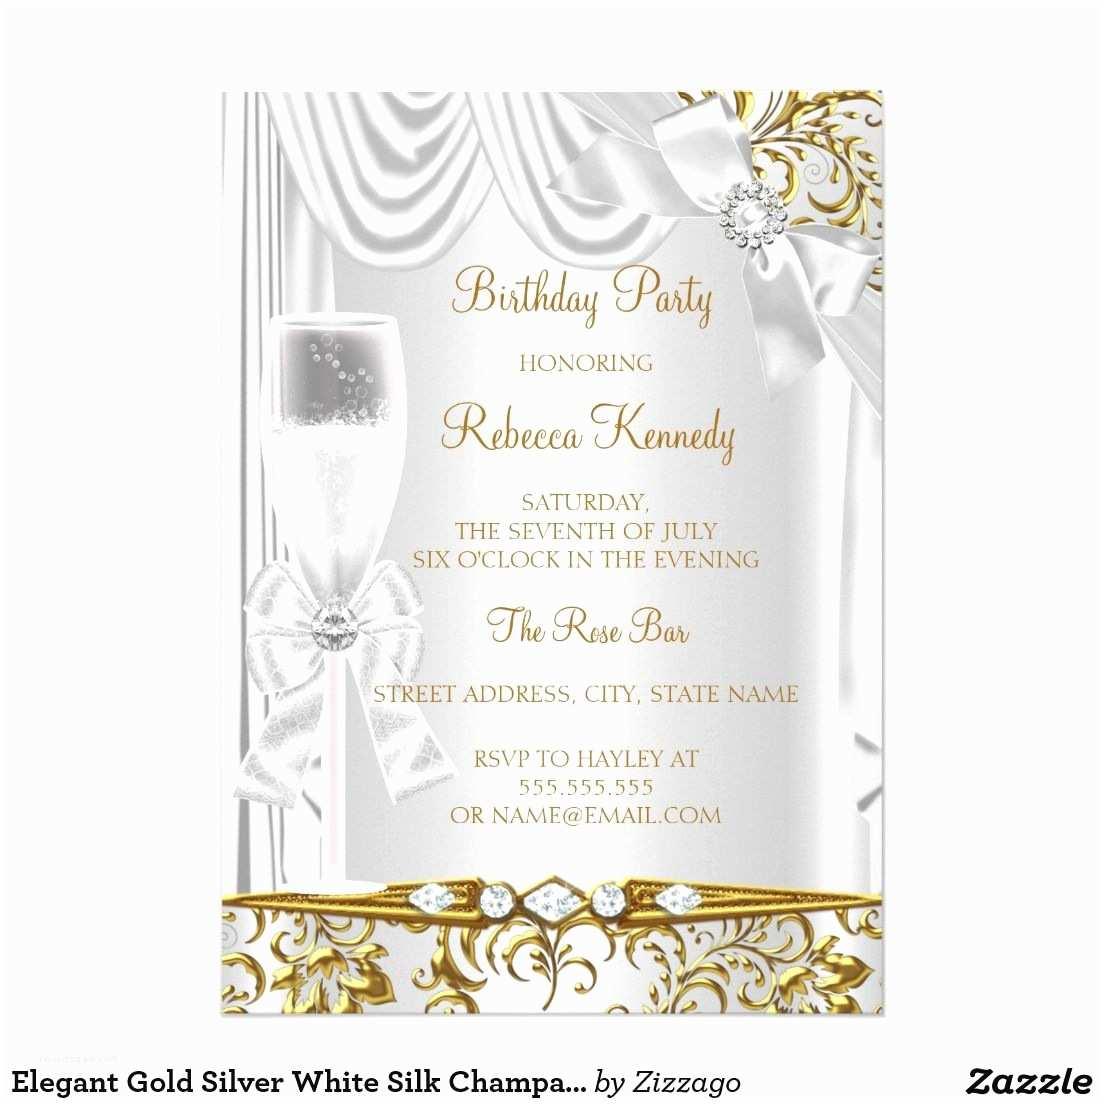 Elegant Party Invitations Elegant Gold Silver White Silk Champagne Birthday Card